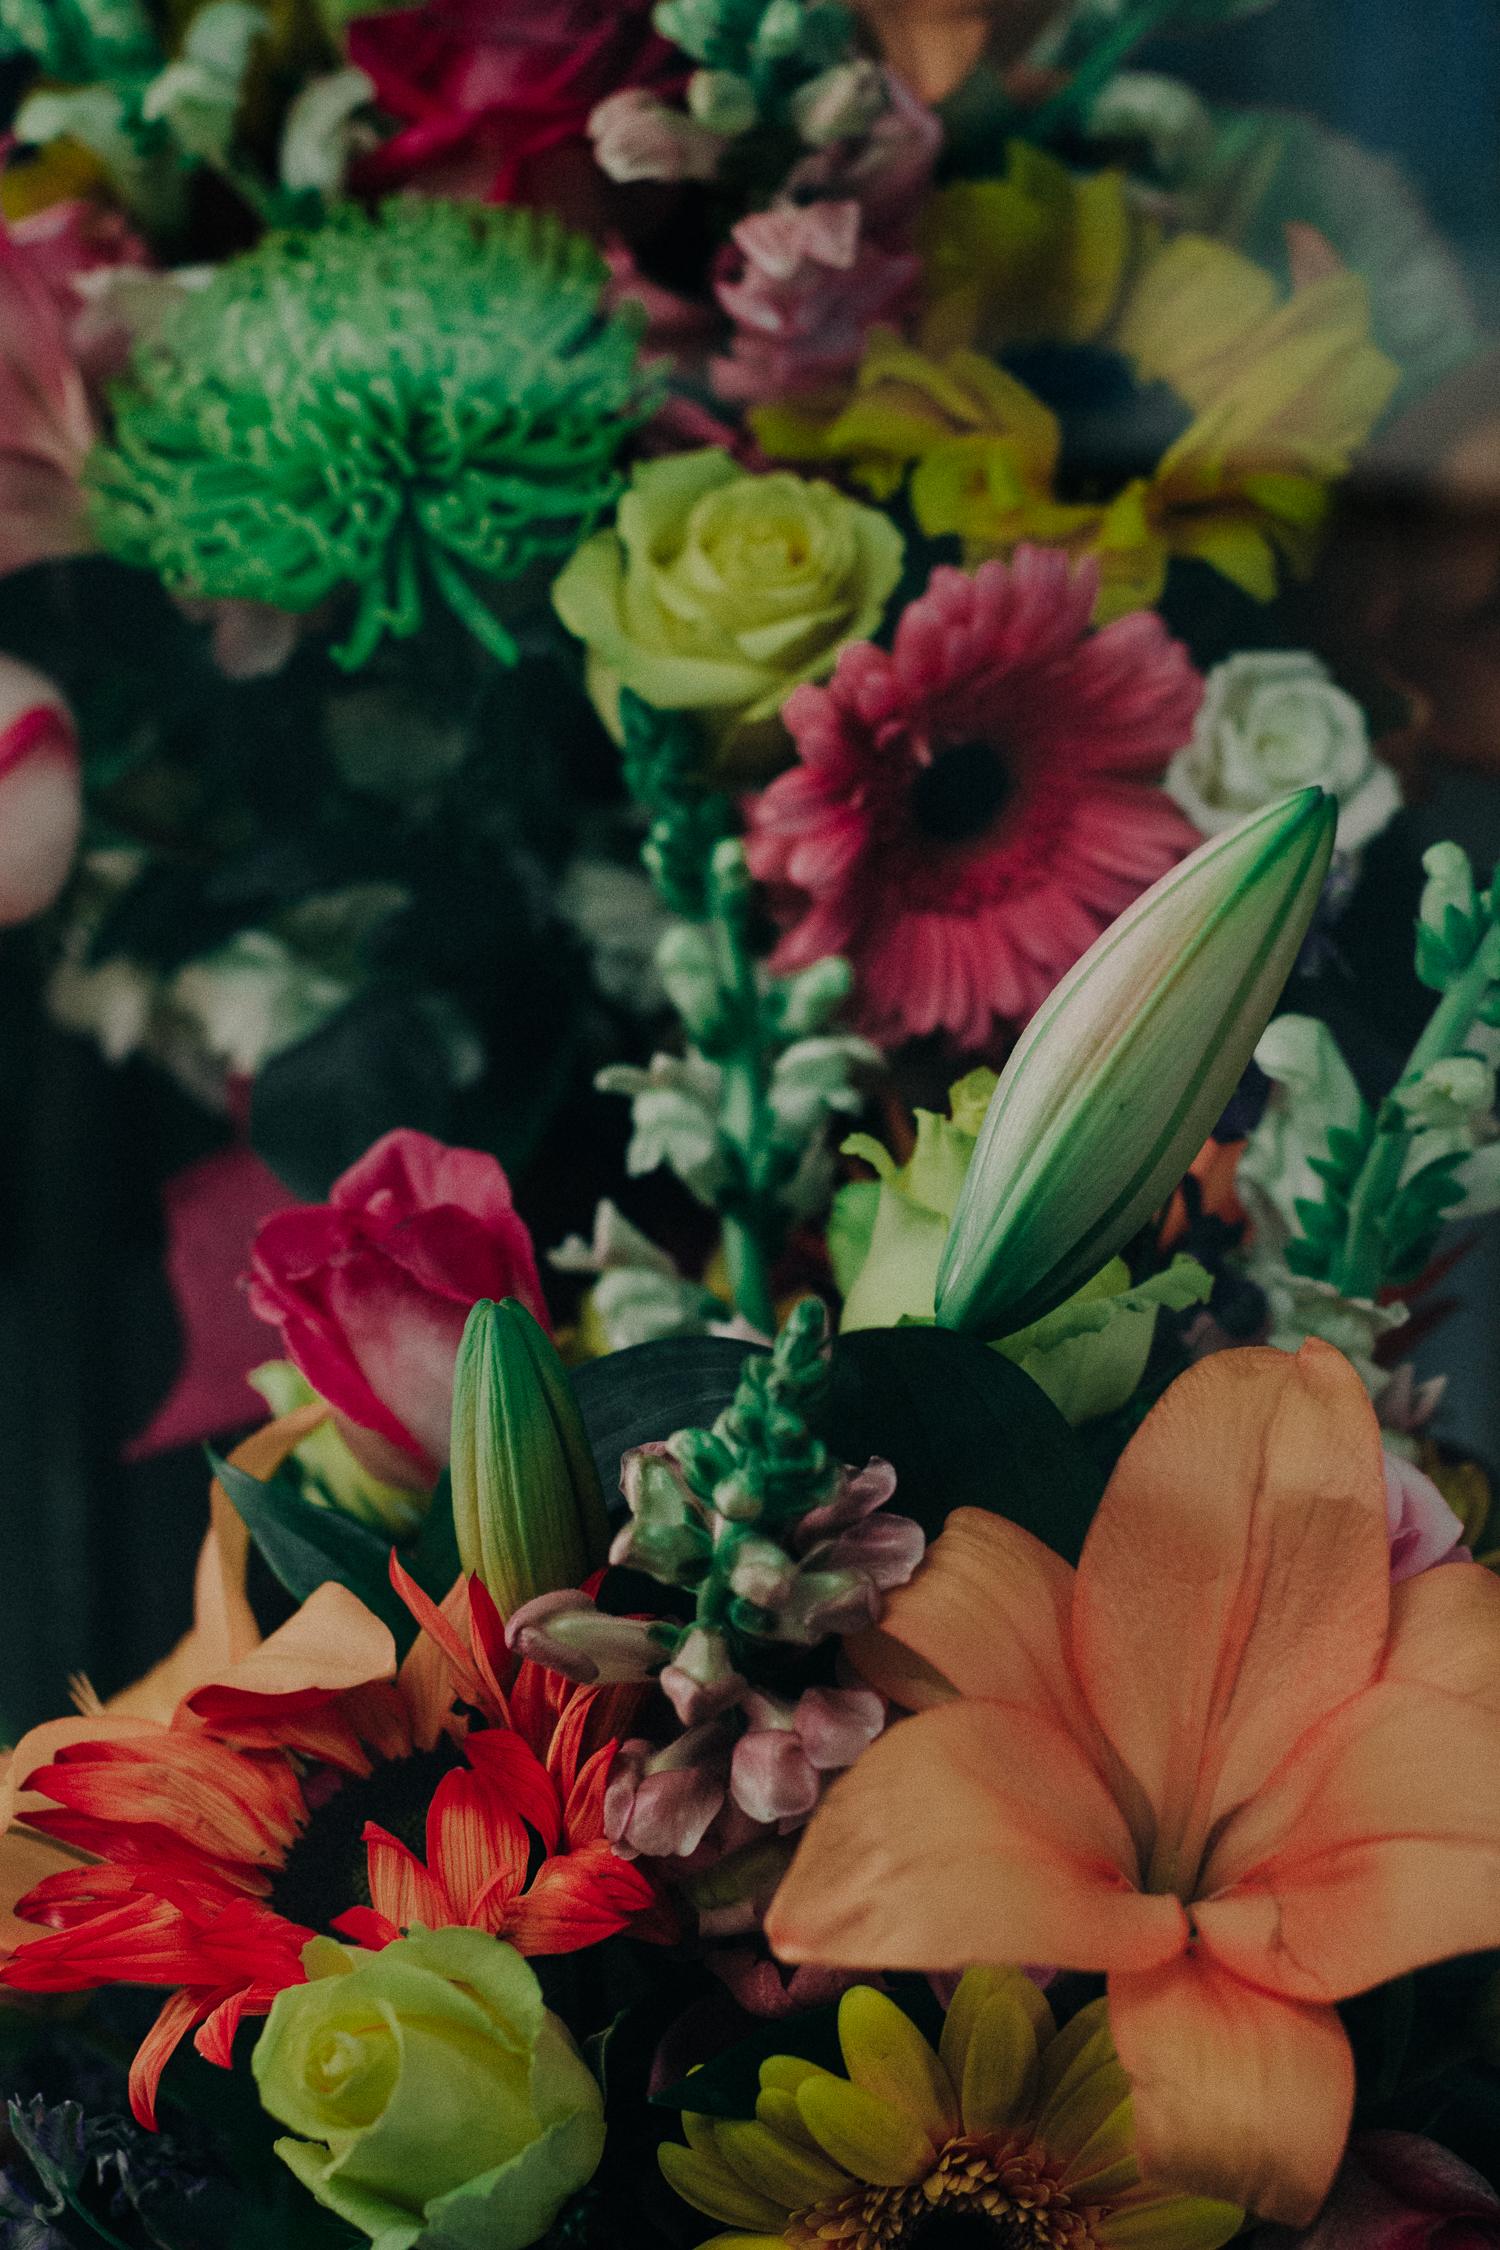 MELISSA-PHELAN-WEDDING-PHOTOGRAPHER-4571.jpg